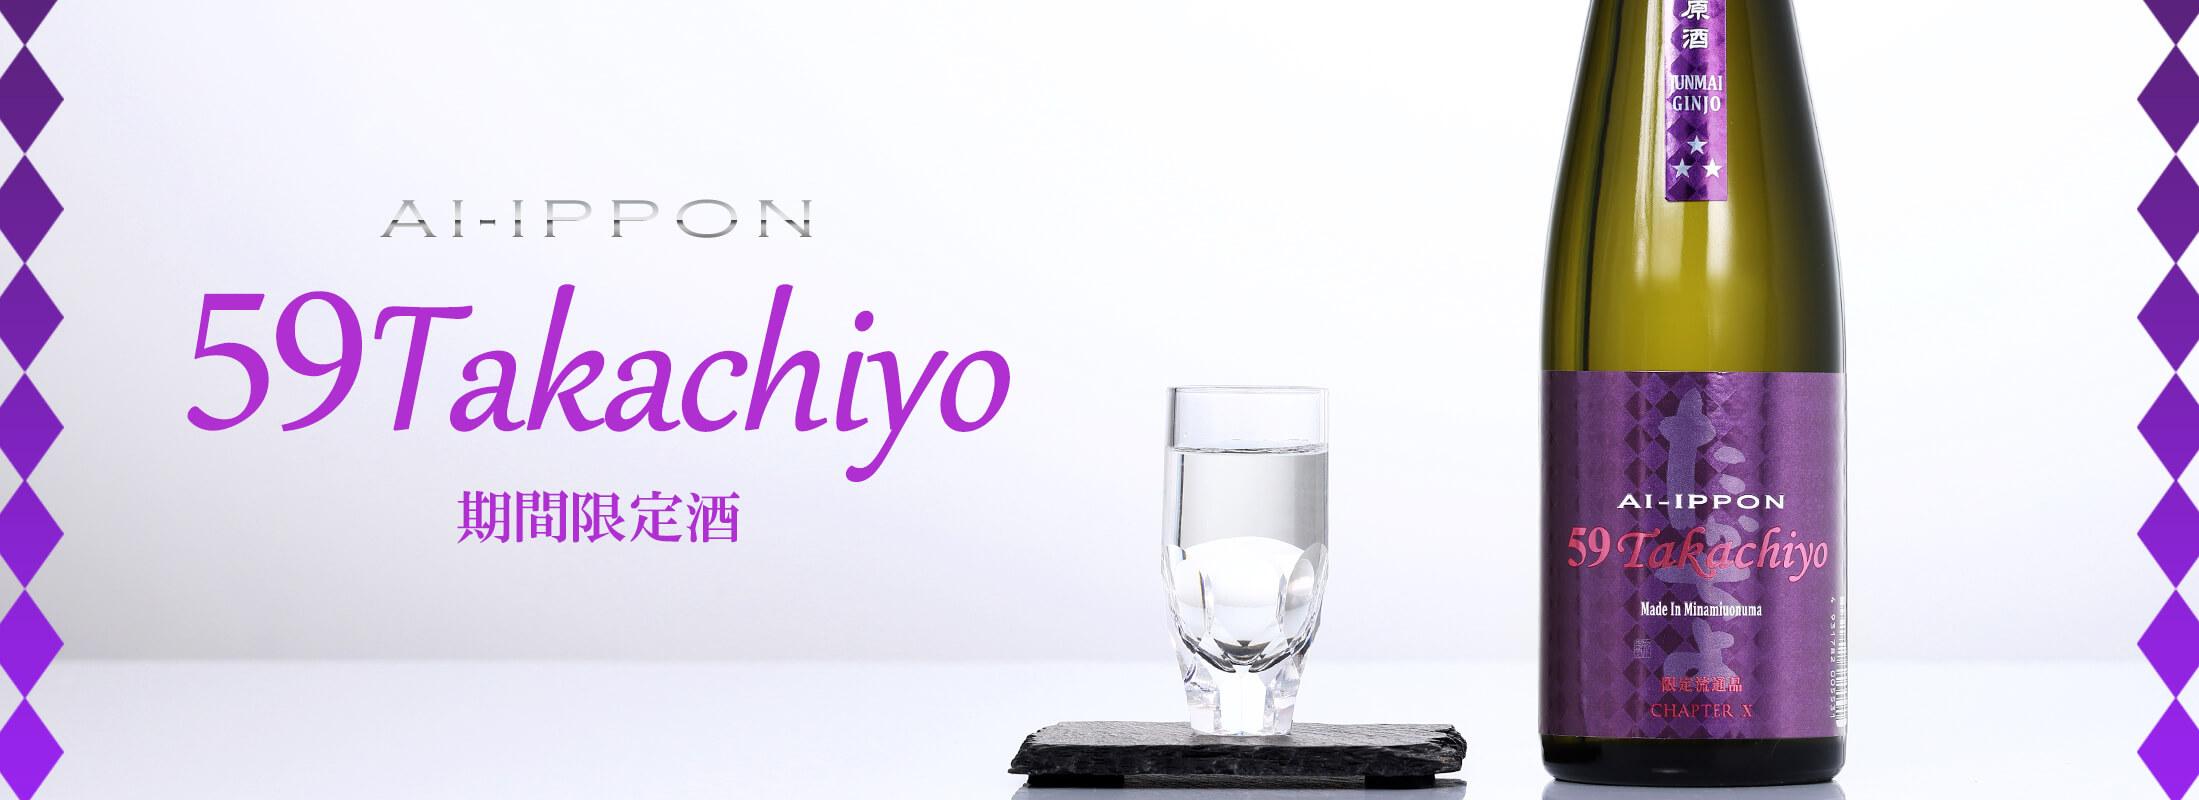 Takachiyo 59(極) 純米吟醸 愛山一本〆